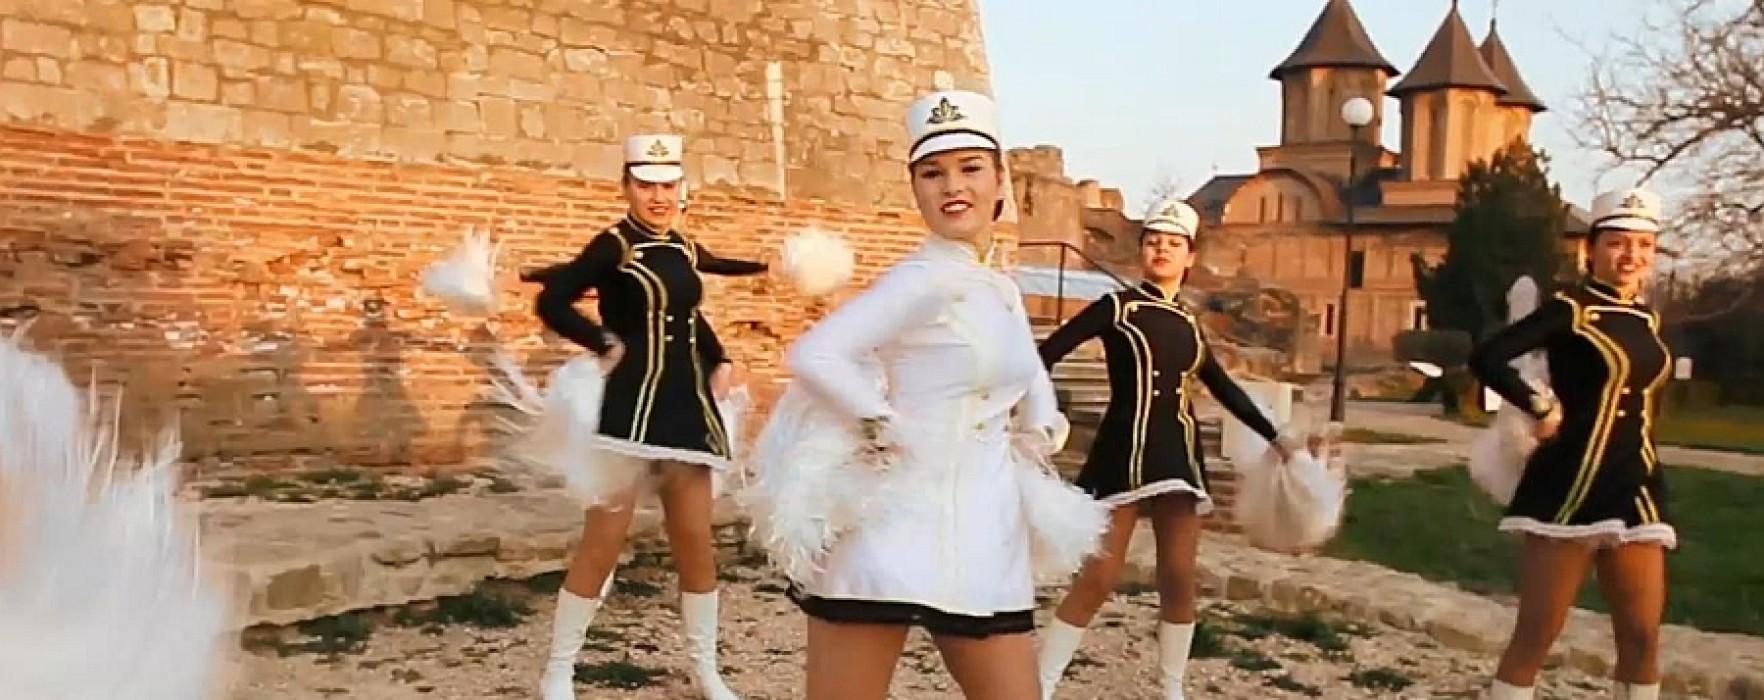 Târgovişte e happy (video)